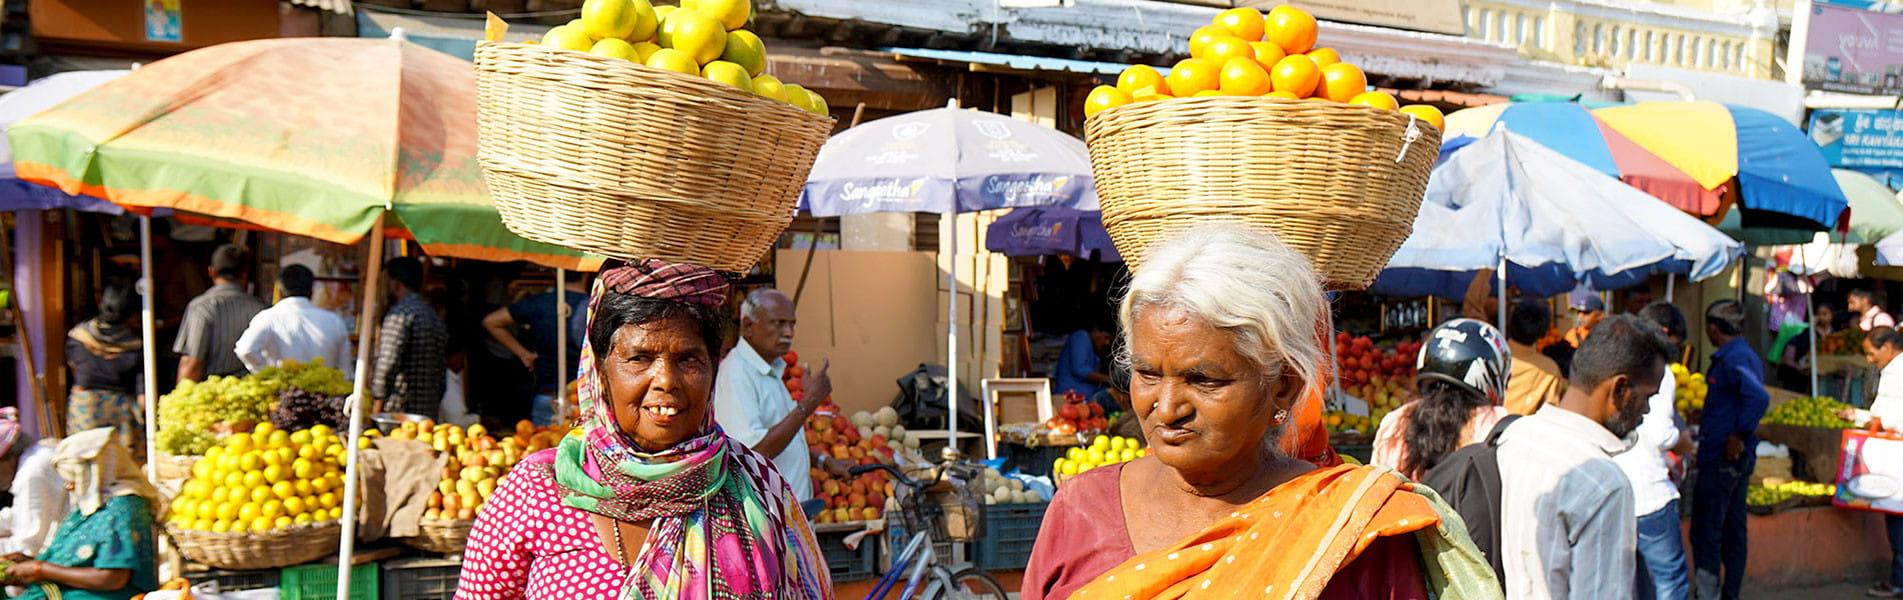 lndian people